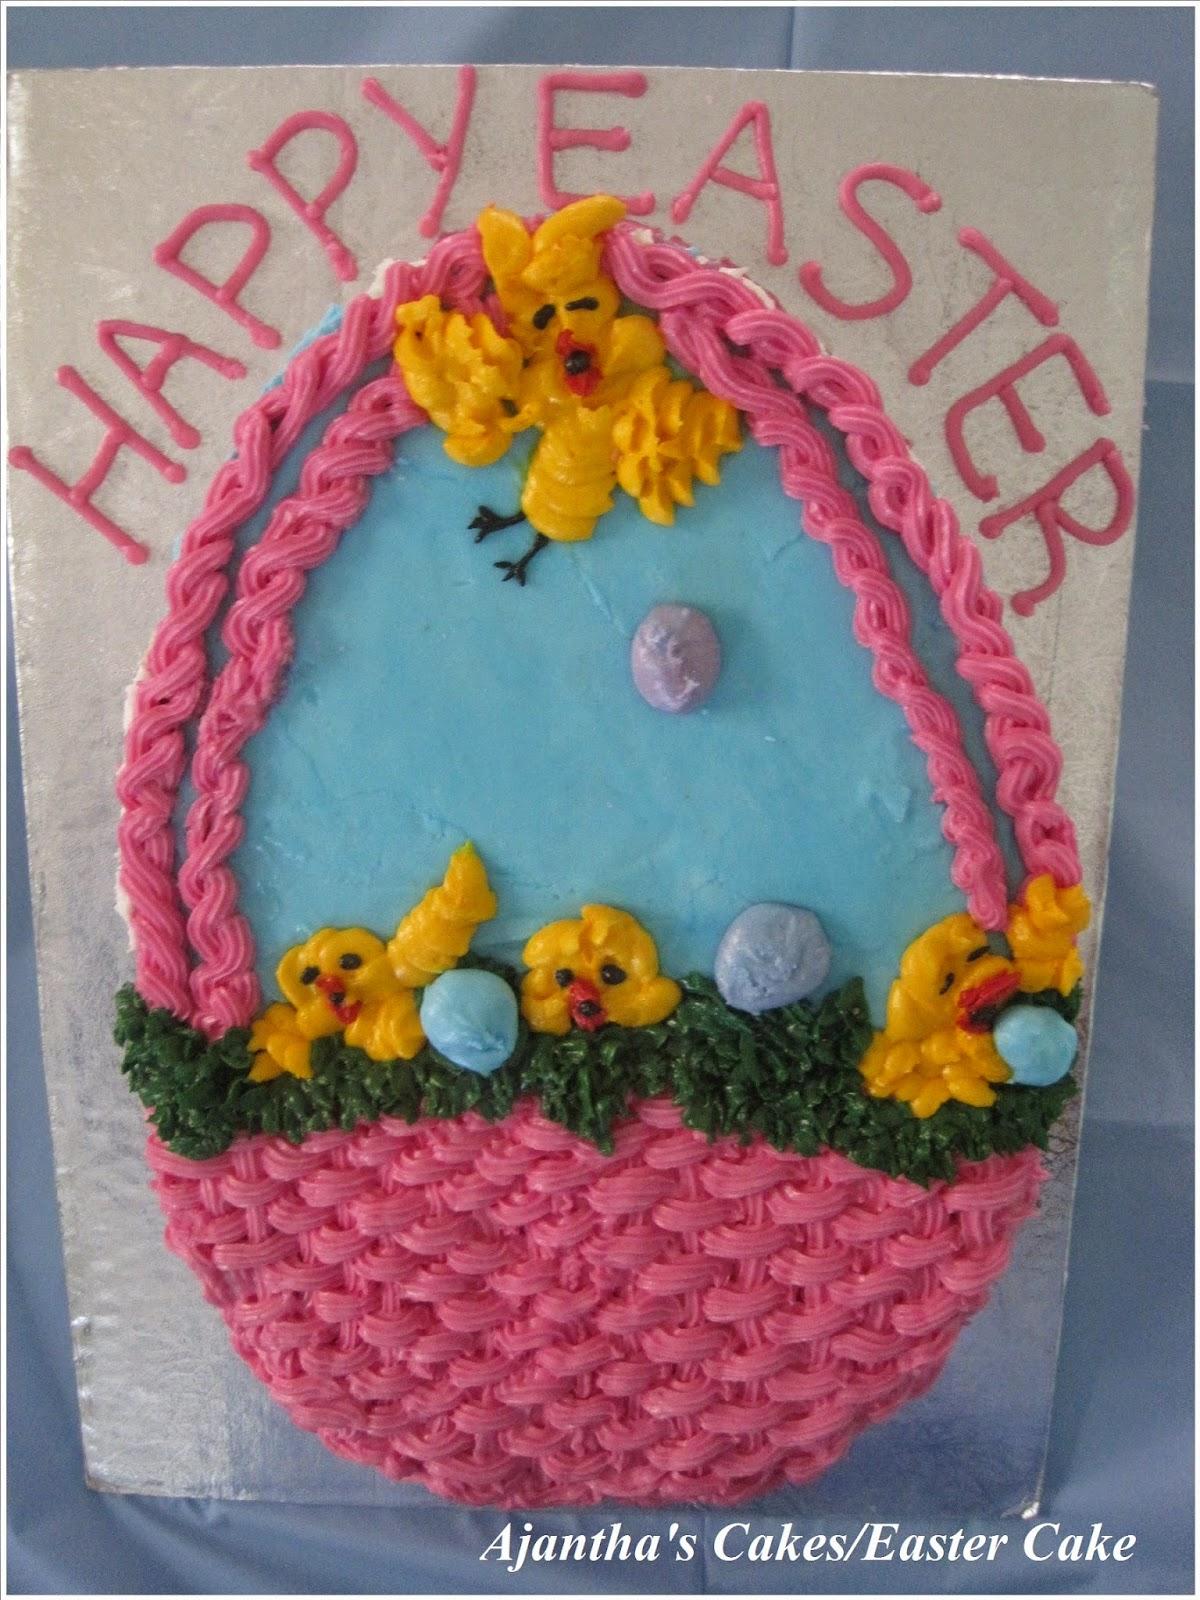 Ajantha Cakes/Easter Cake